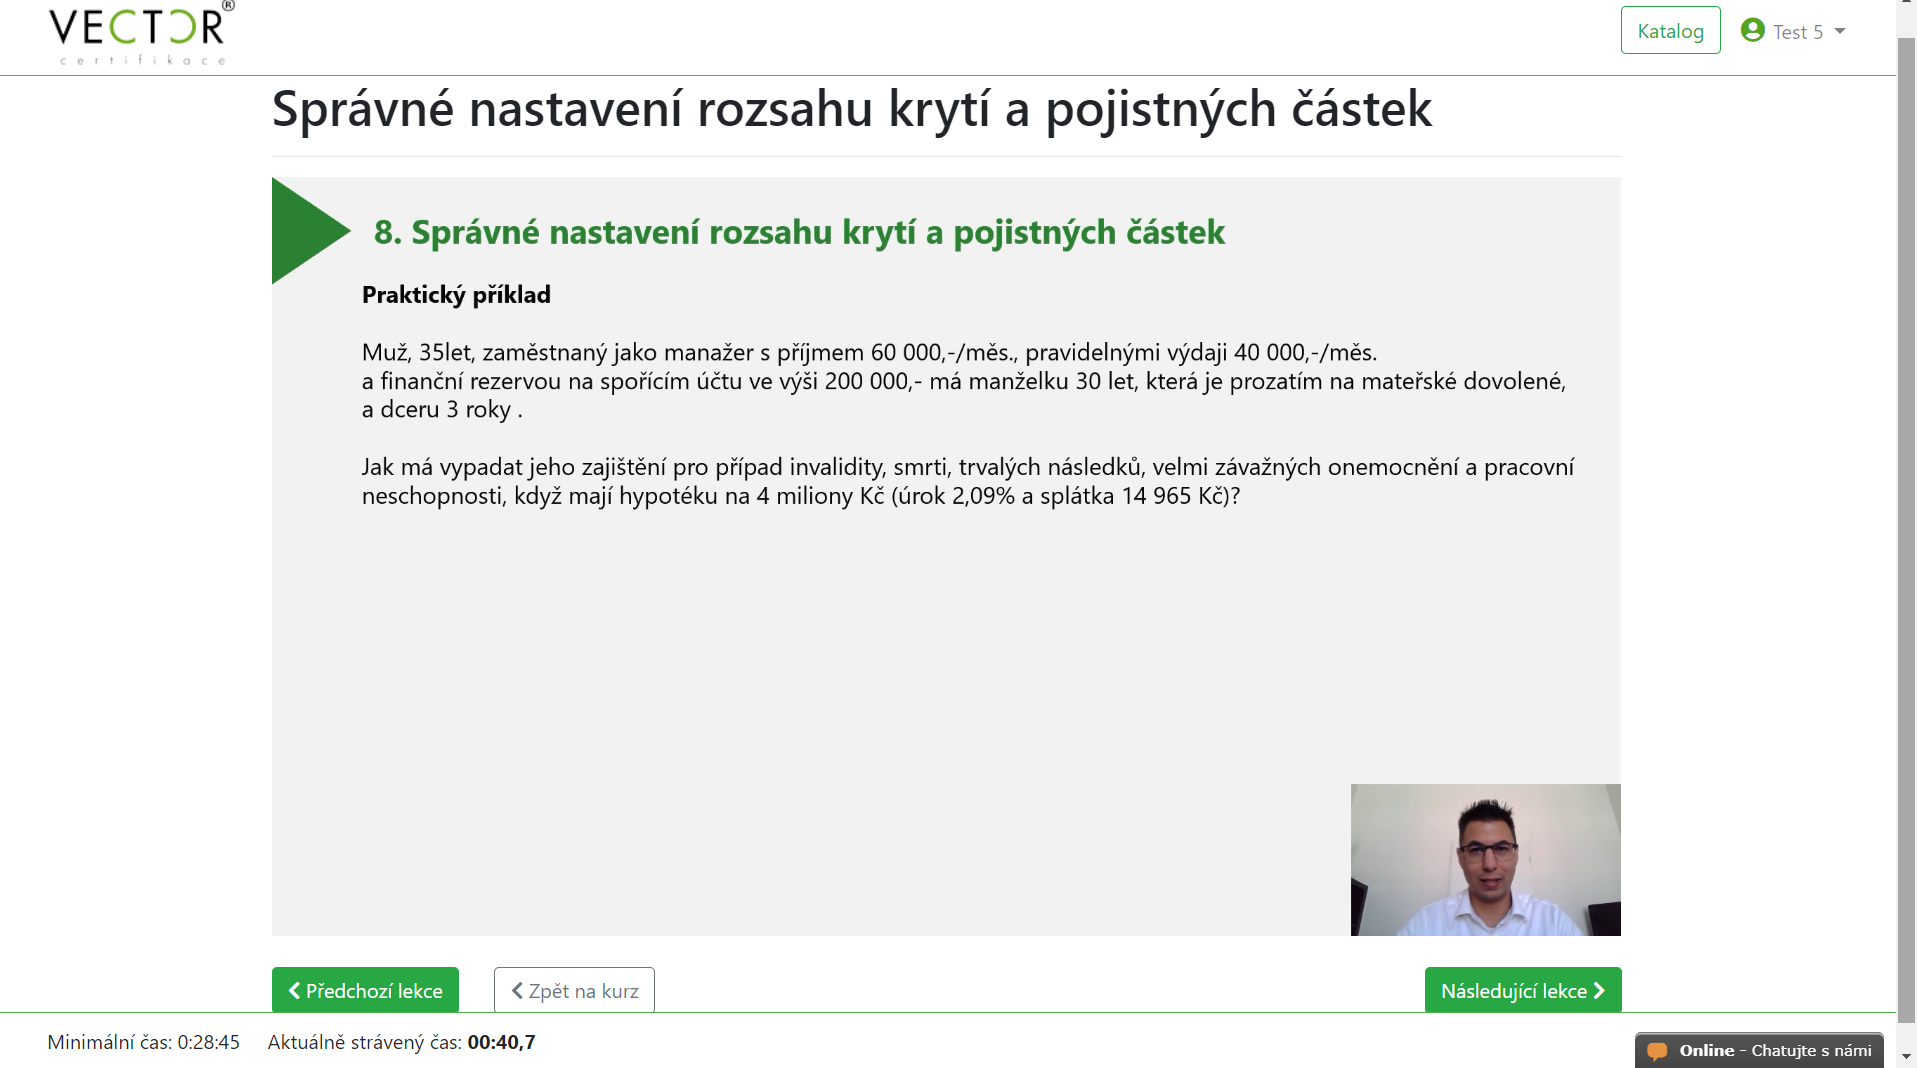 Screenshot 2020-10-08 12.42.56